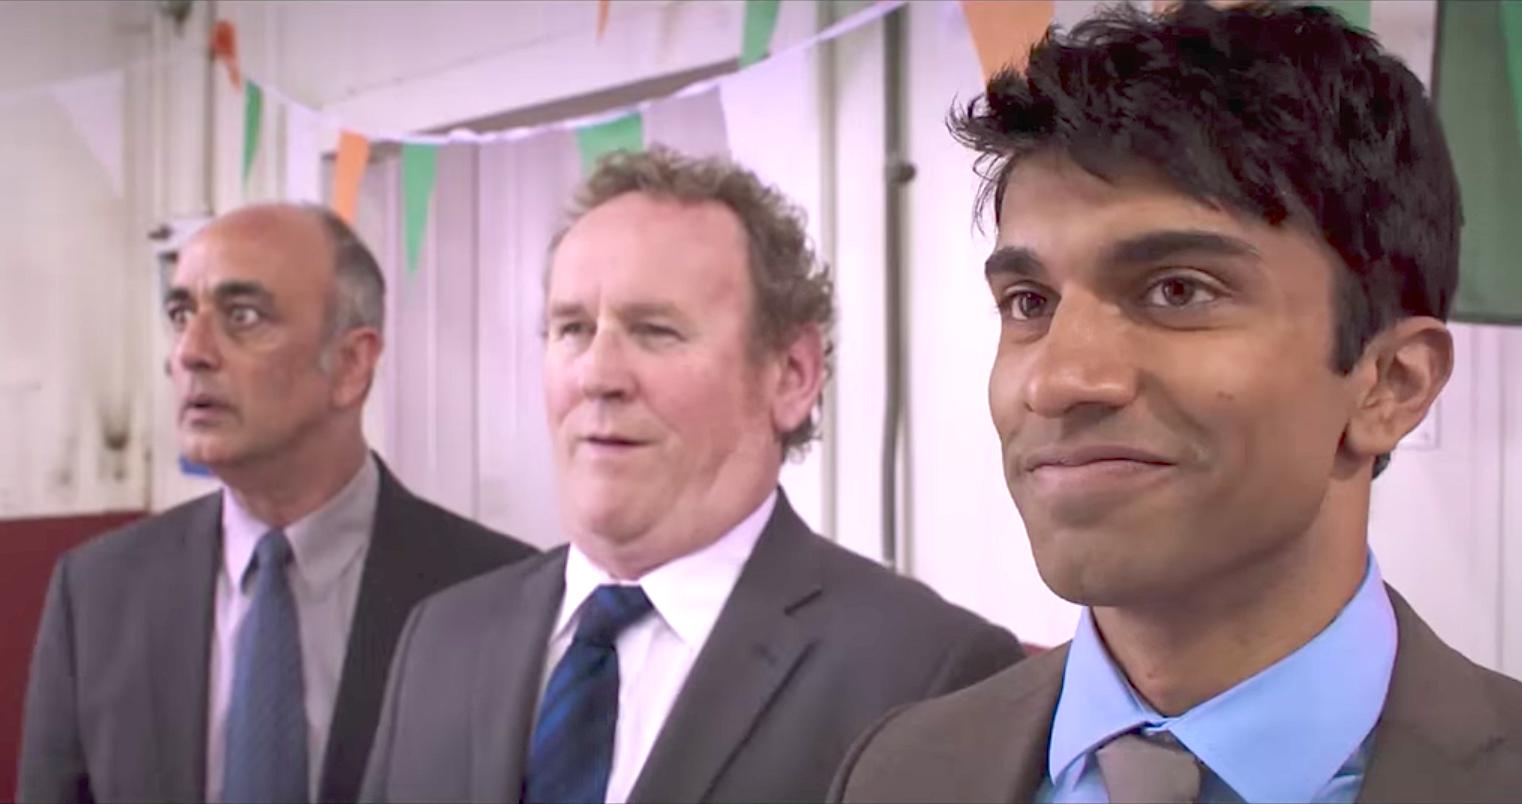 Halal Daddy (2017), Art Malik, Colm Meaney, Nikesh Patel